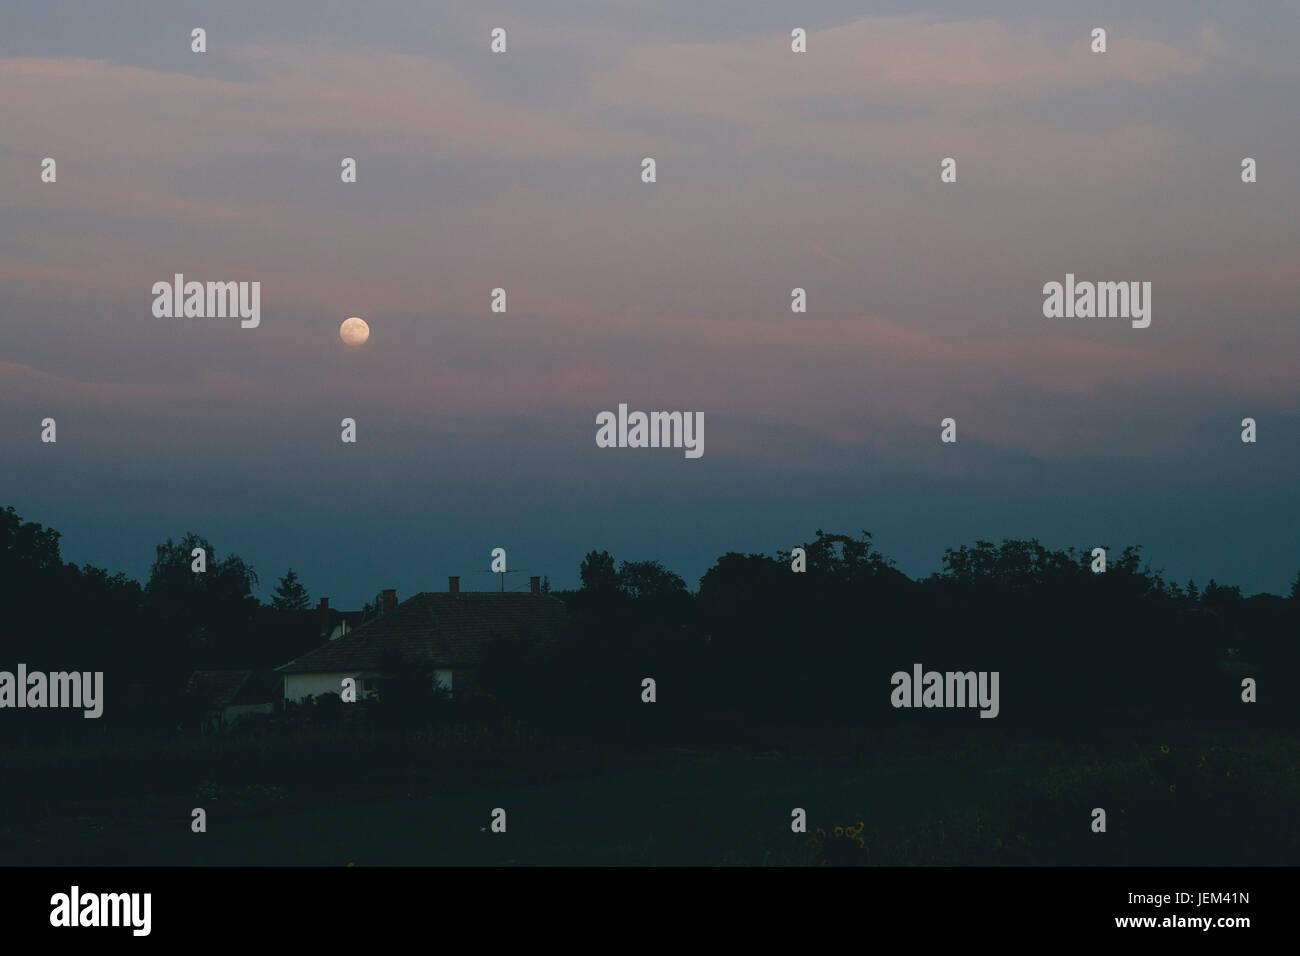 Moonrise over village - Stock Image